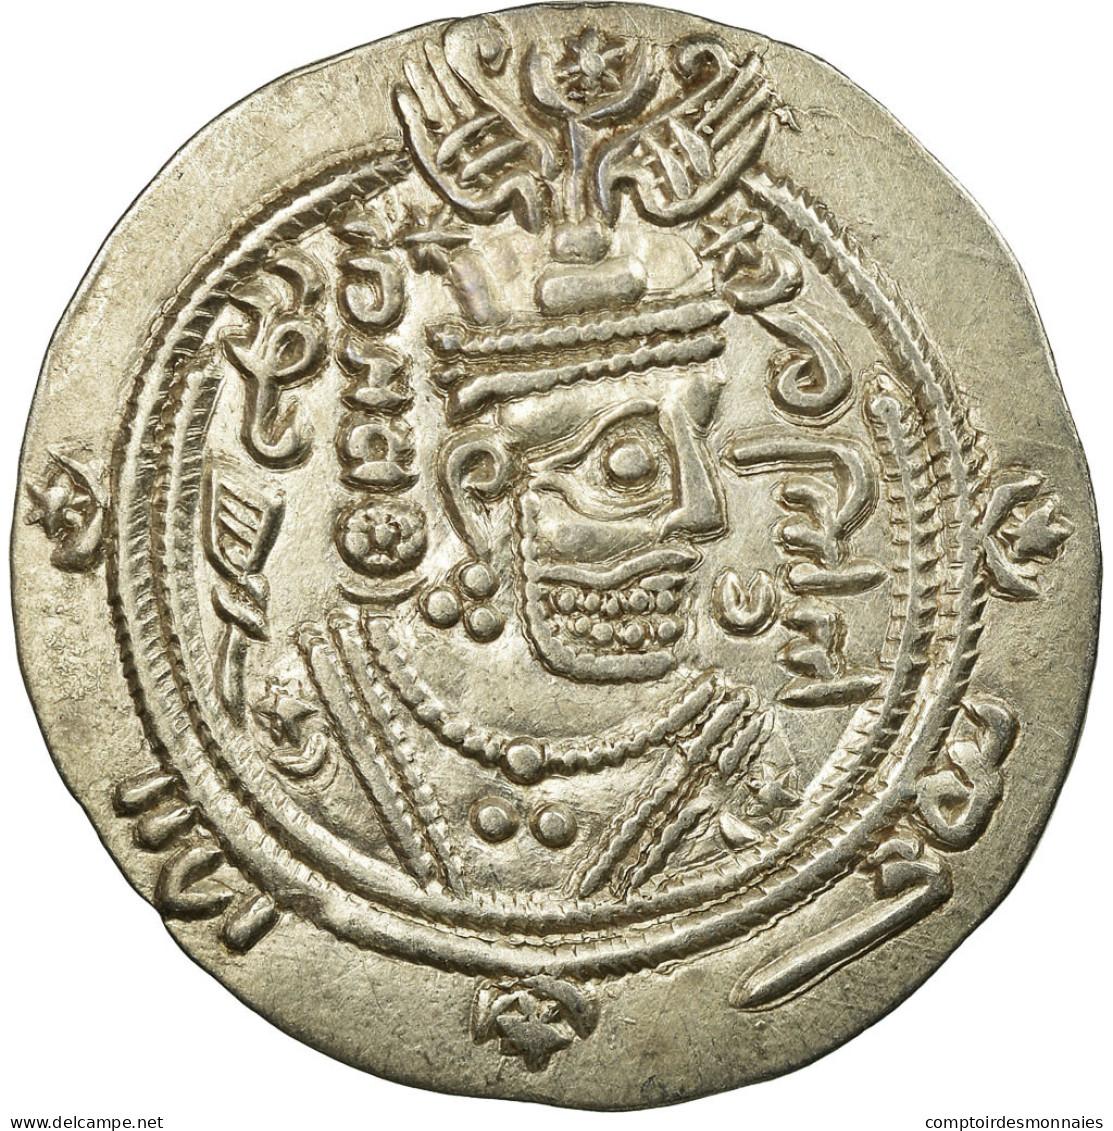 Monnaie, Tabaristan, Dabwayhid Ispahbads, Farkhan, Hémidrachme, PYE 76 (110 - Orientales